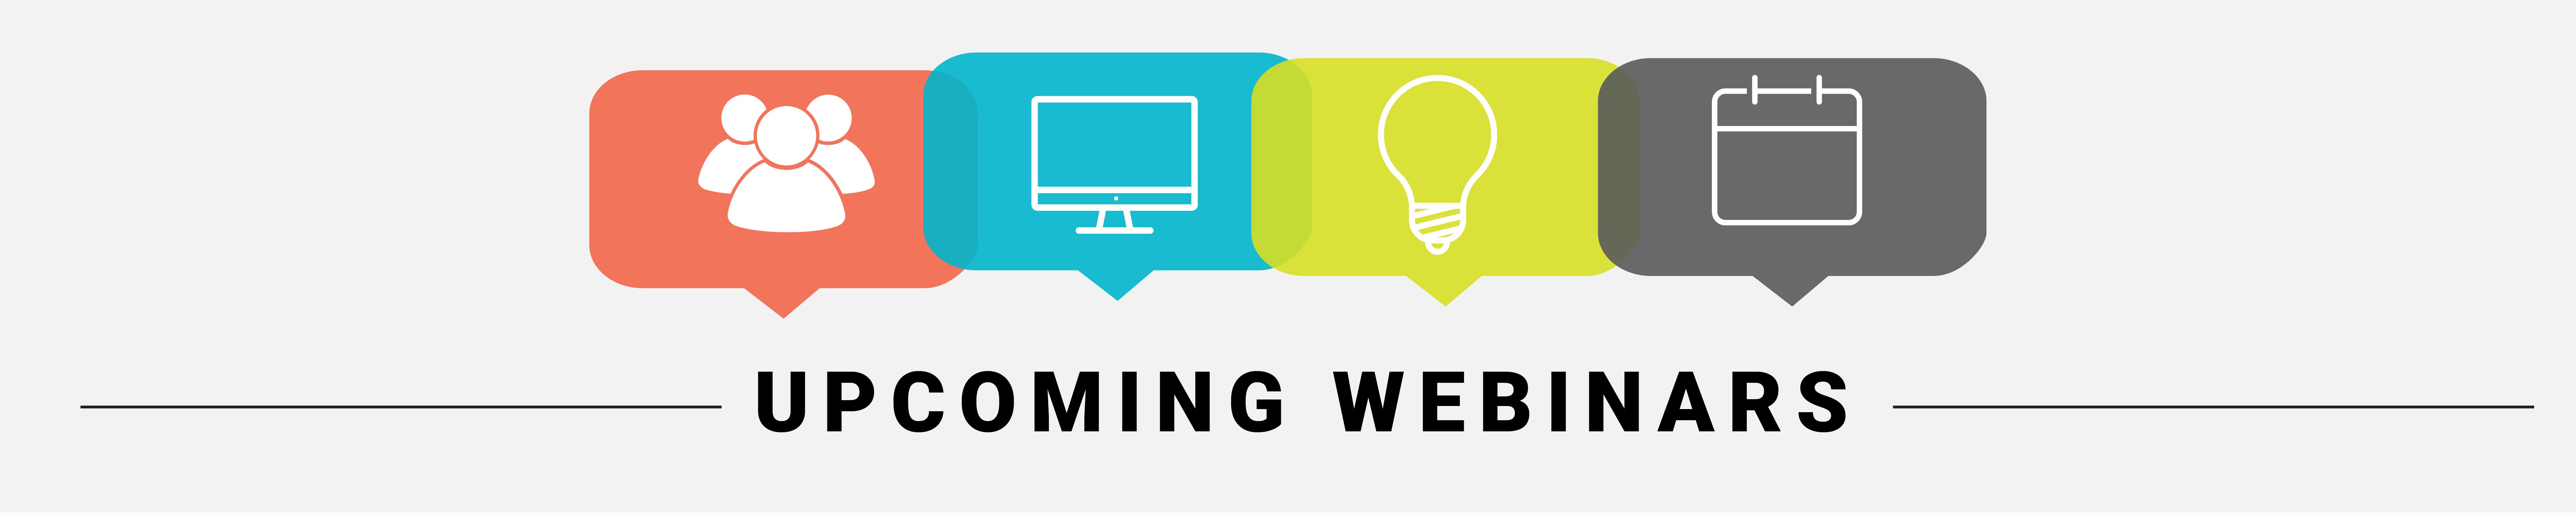 "Banner reading ""Upcoming Webinars"""